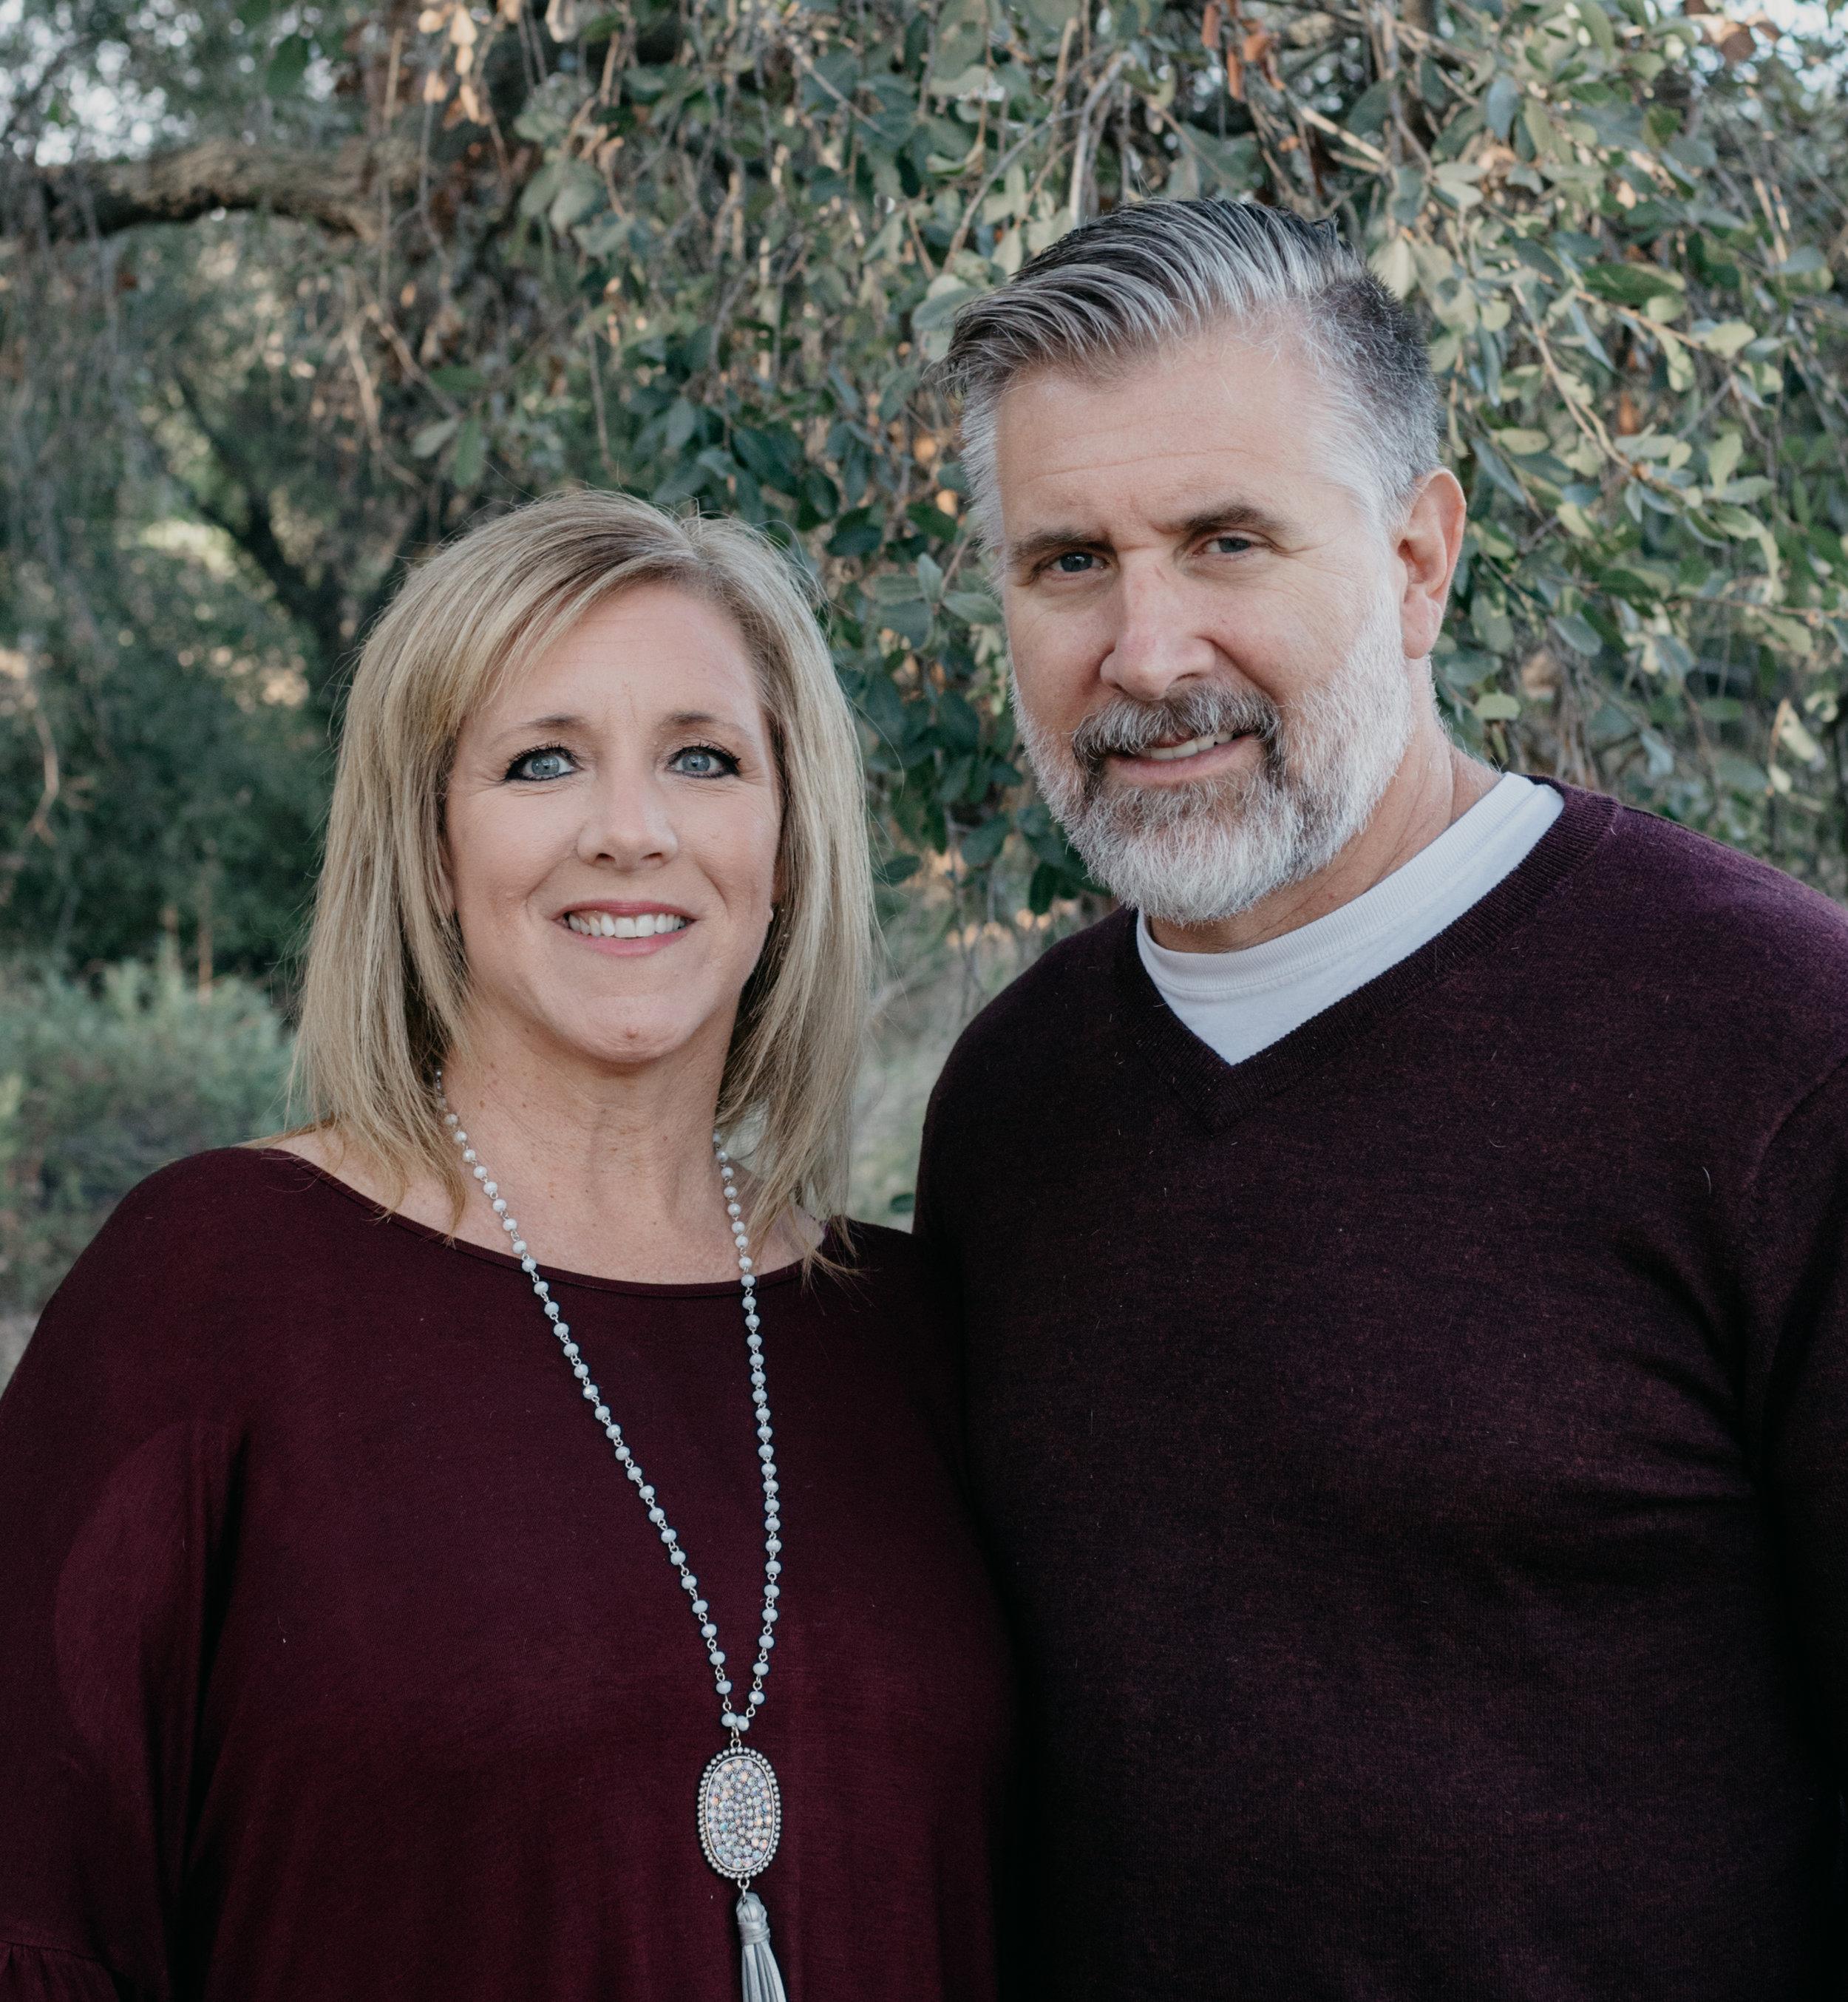 Executive Pastors, Rob & Becky Granger -            Normal  0          false  false  false    EN-US  ZH-CN  AR-SA                                                                                                                                                                                                                                                                                                                                                                                                                                                                                                                                                                                                                                                                                                                                                                                                                                                       /* Style Definitions */ table.MsoNormalTable {mso-style-name: